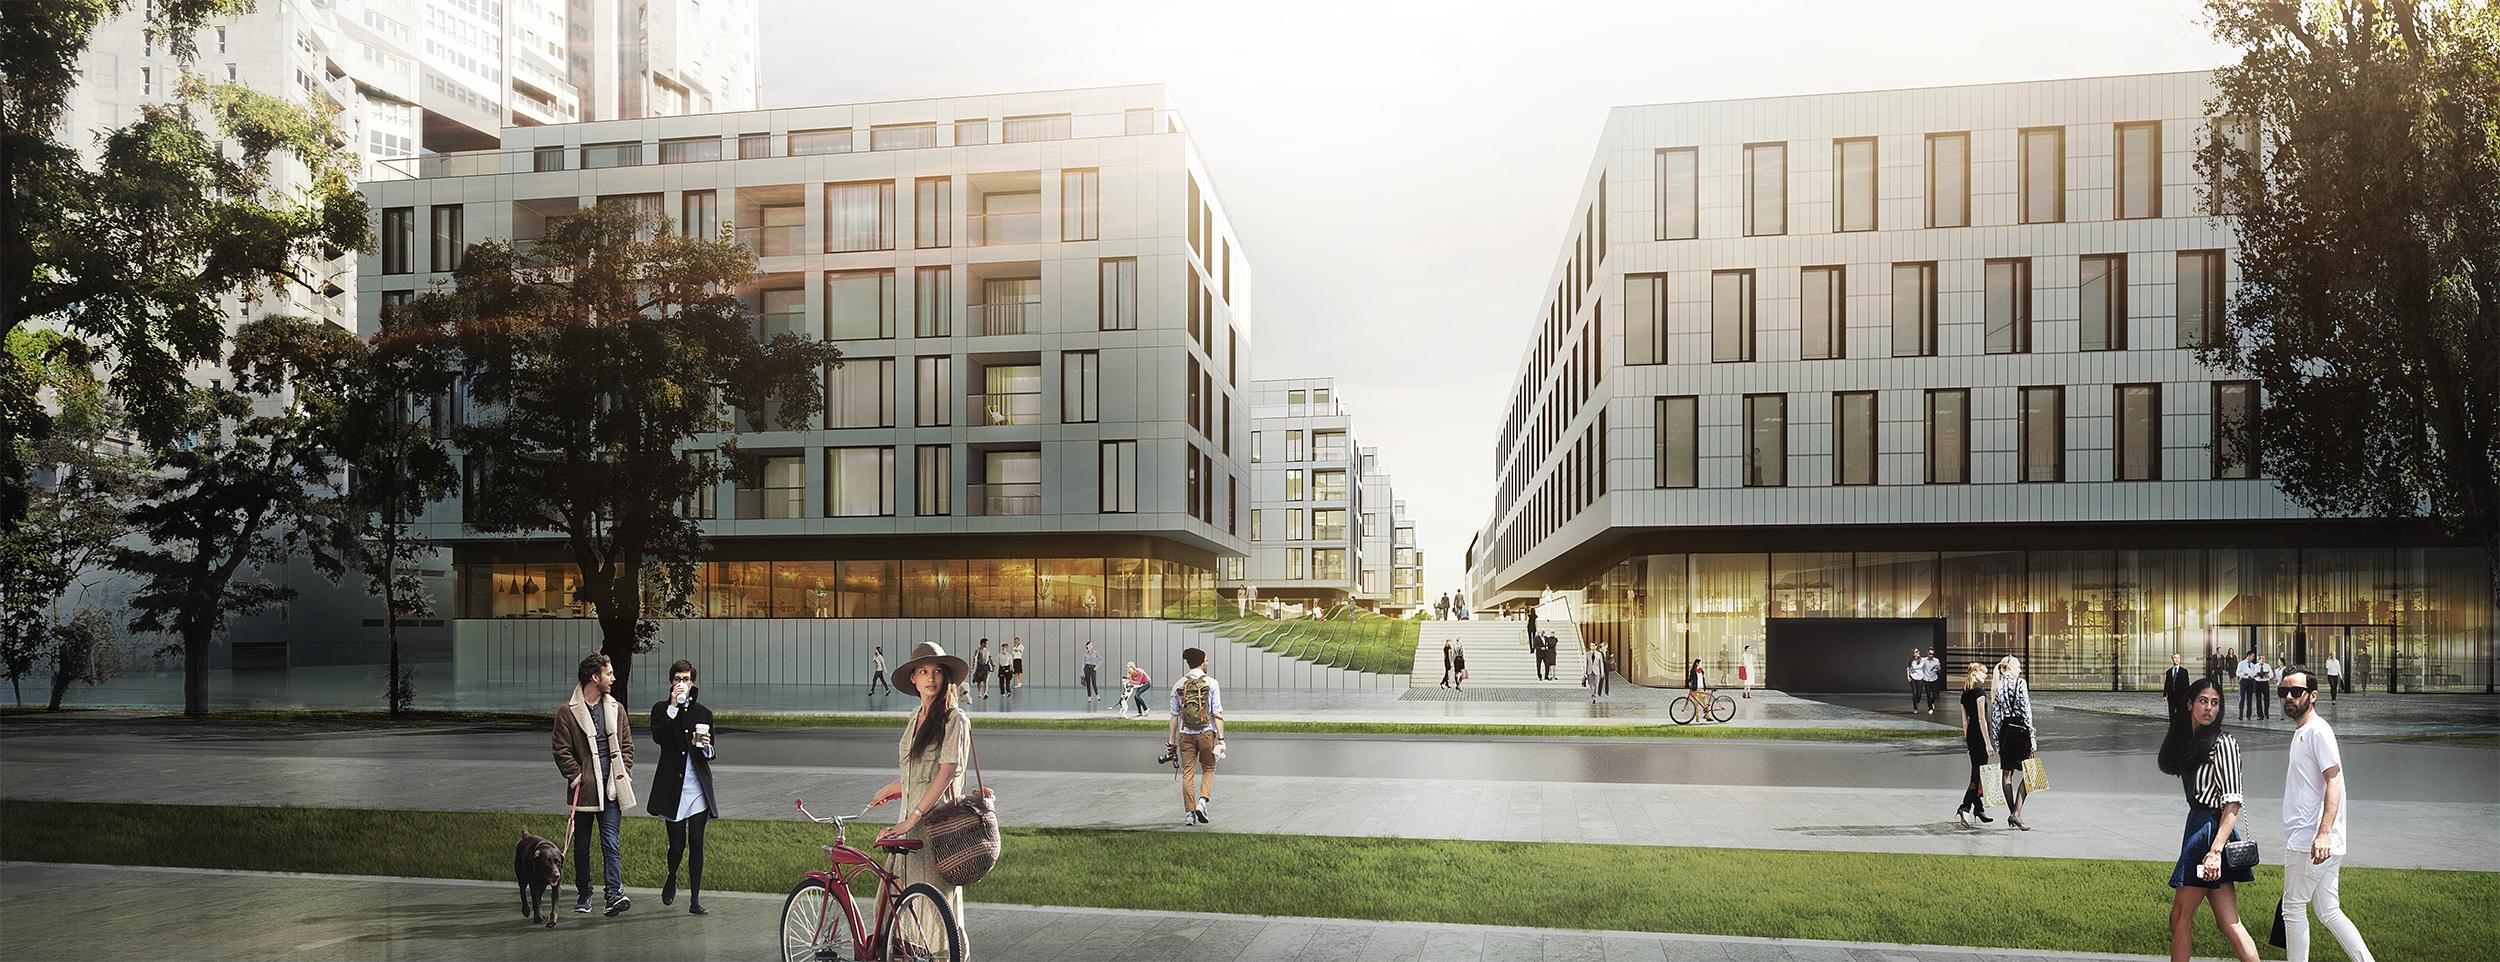 GDYNIA-Waterfront-Housing-MJZ-7